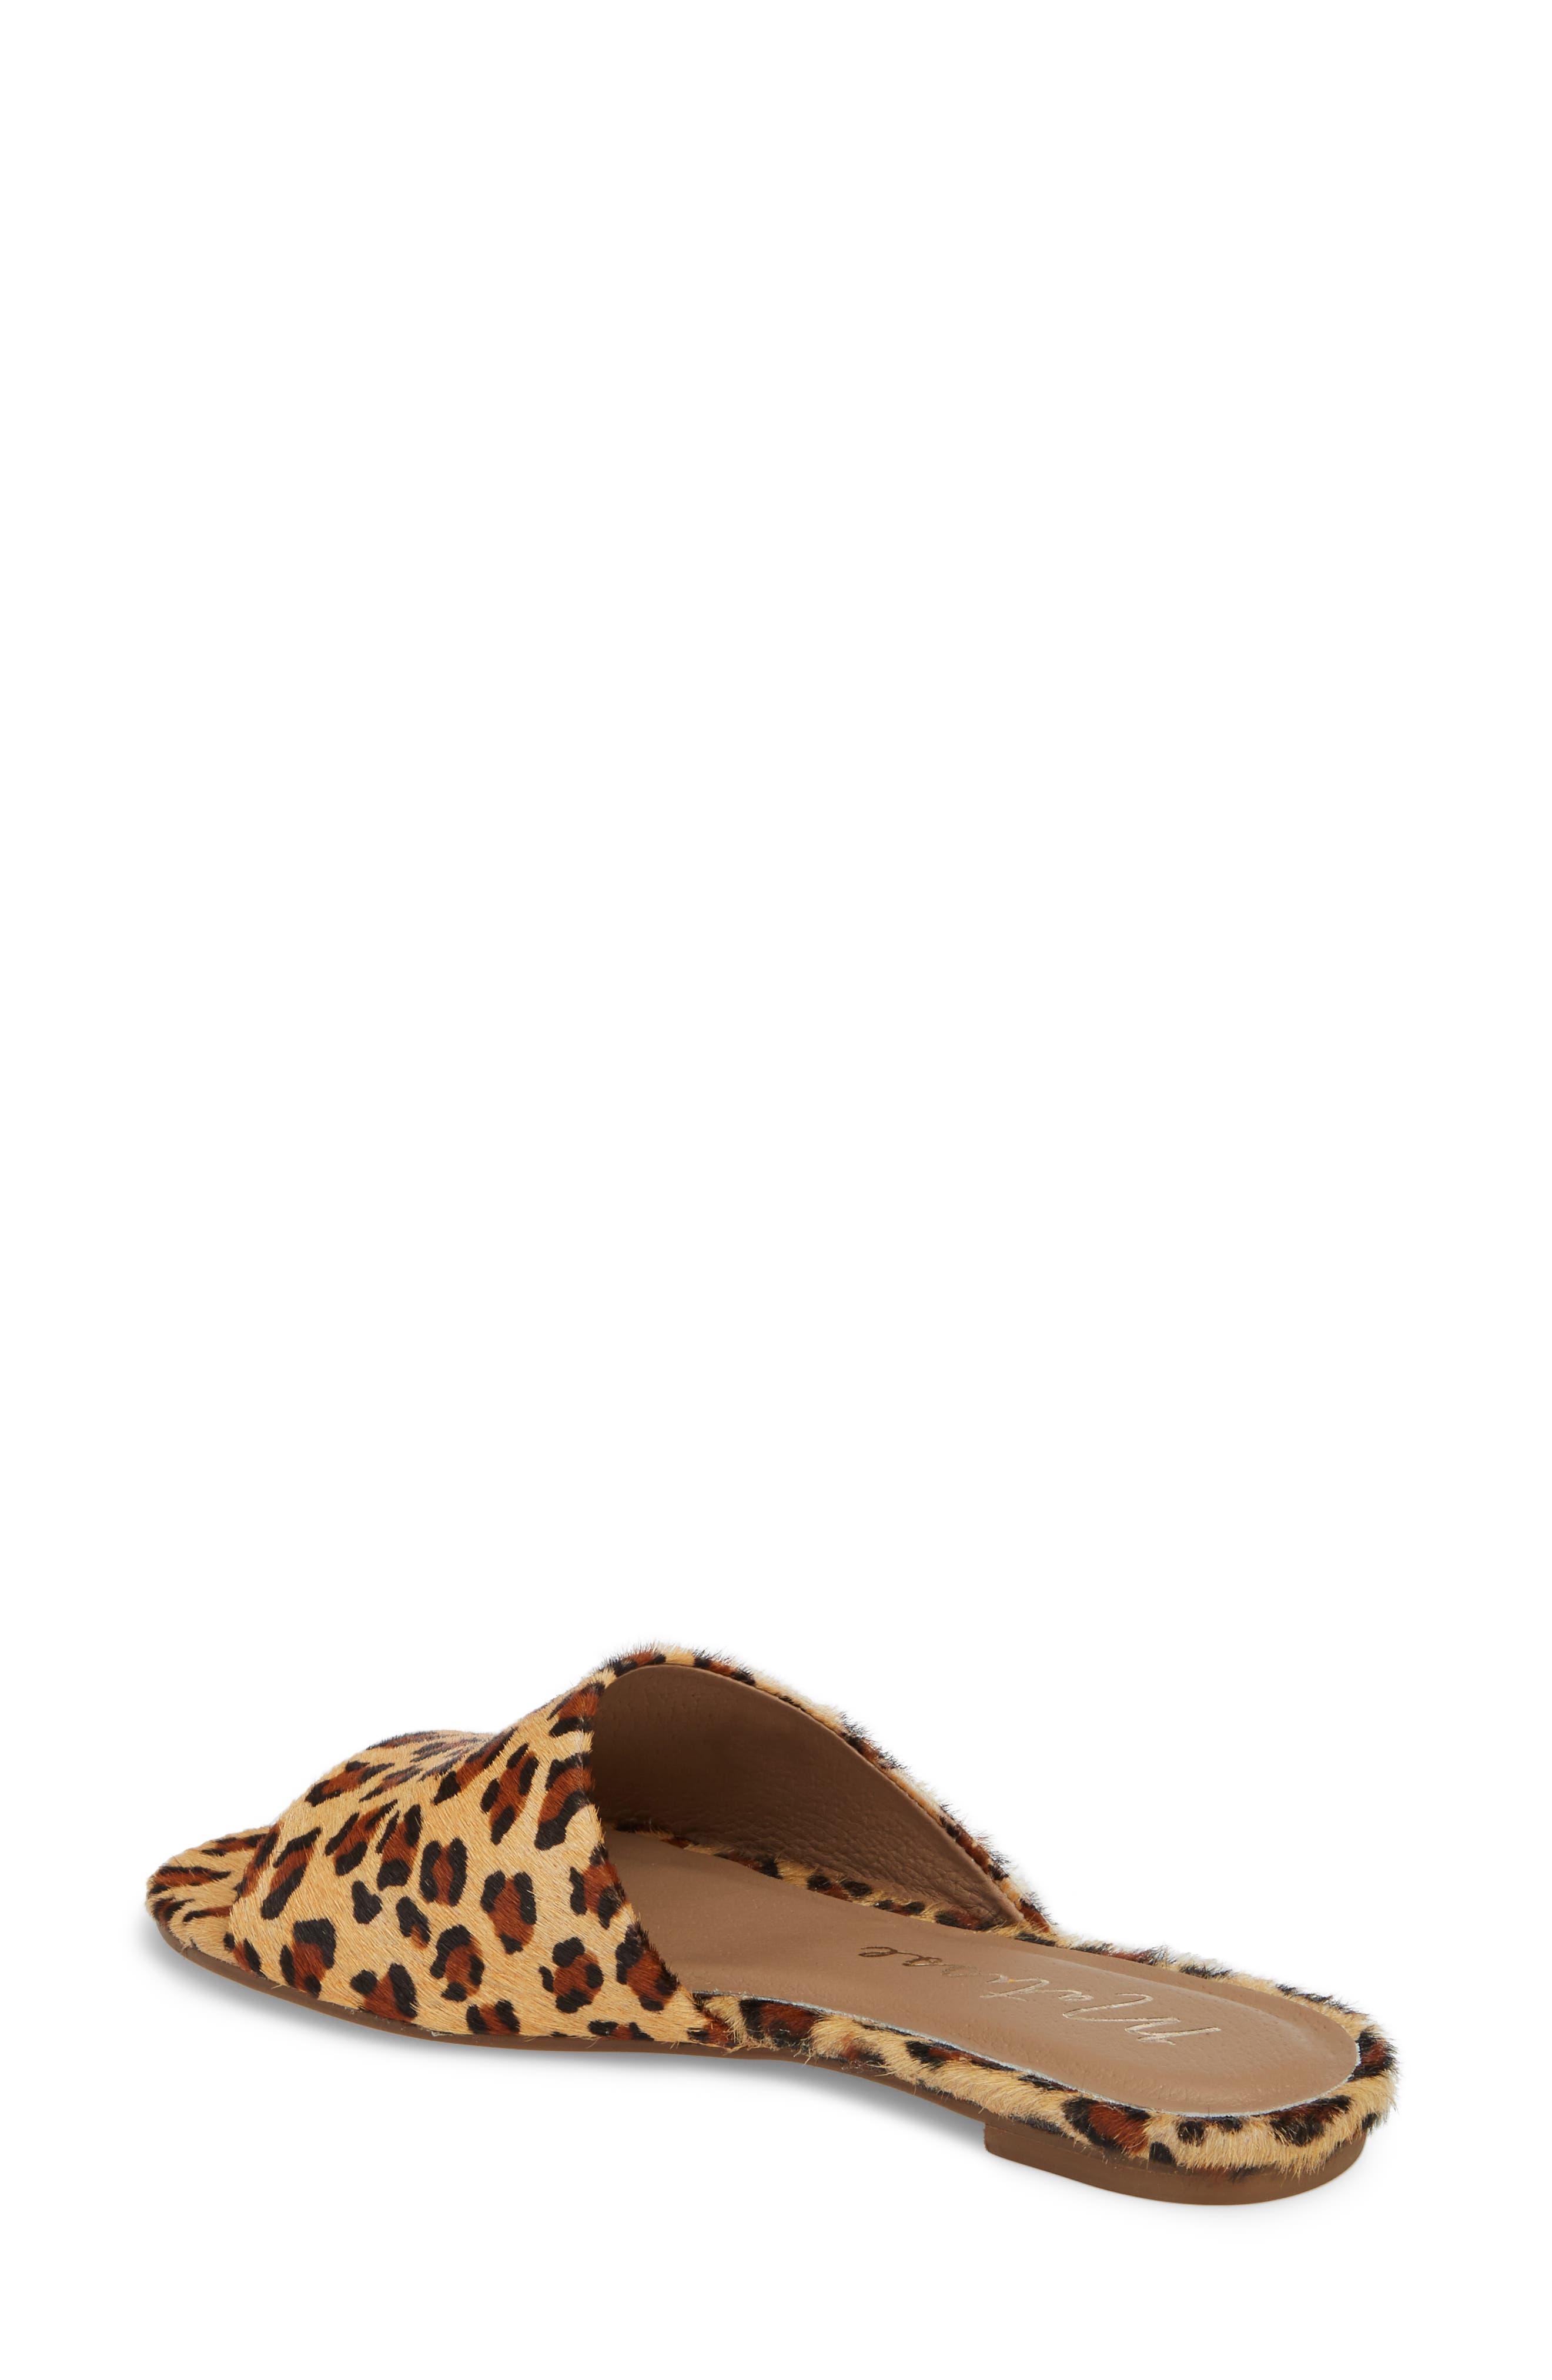 Lira Genuine Calf Hair Sandal,                             Alternate thumbnail 2, color,                             LEOPARD LEATHER